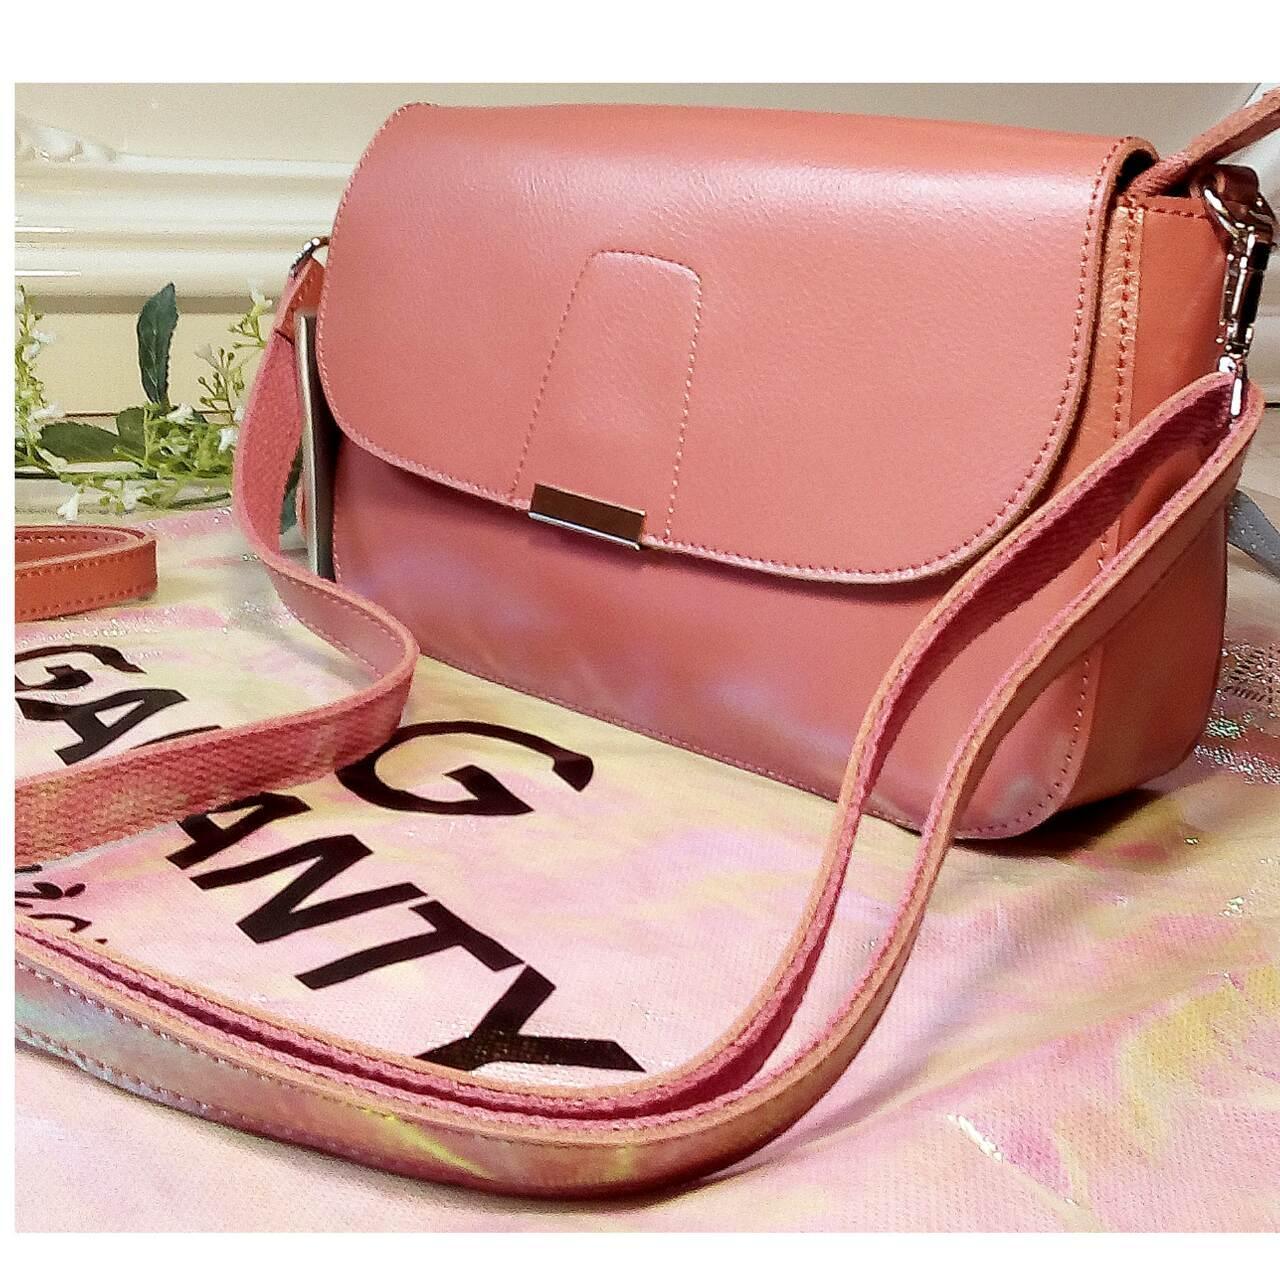 a05e0ae67e3a Женская сумка-клатч кожаная Galanty - Интернет магазин